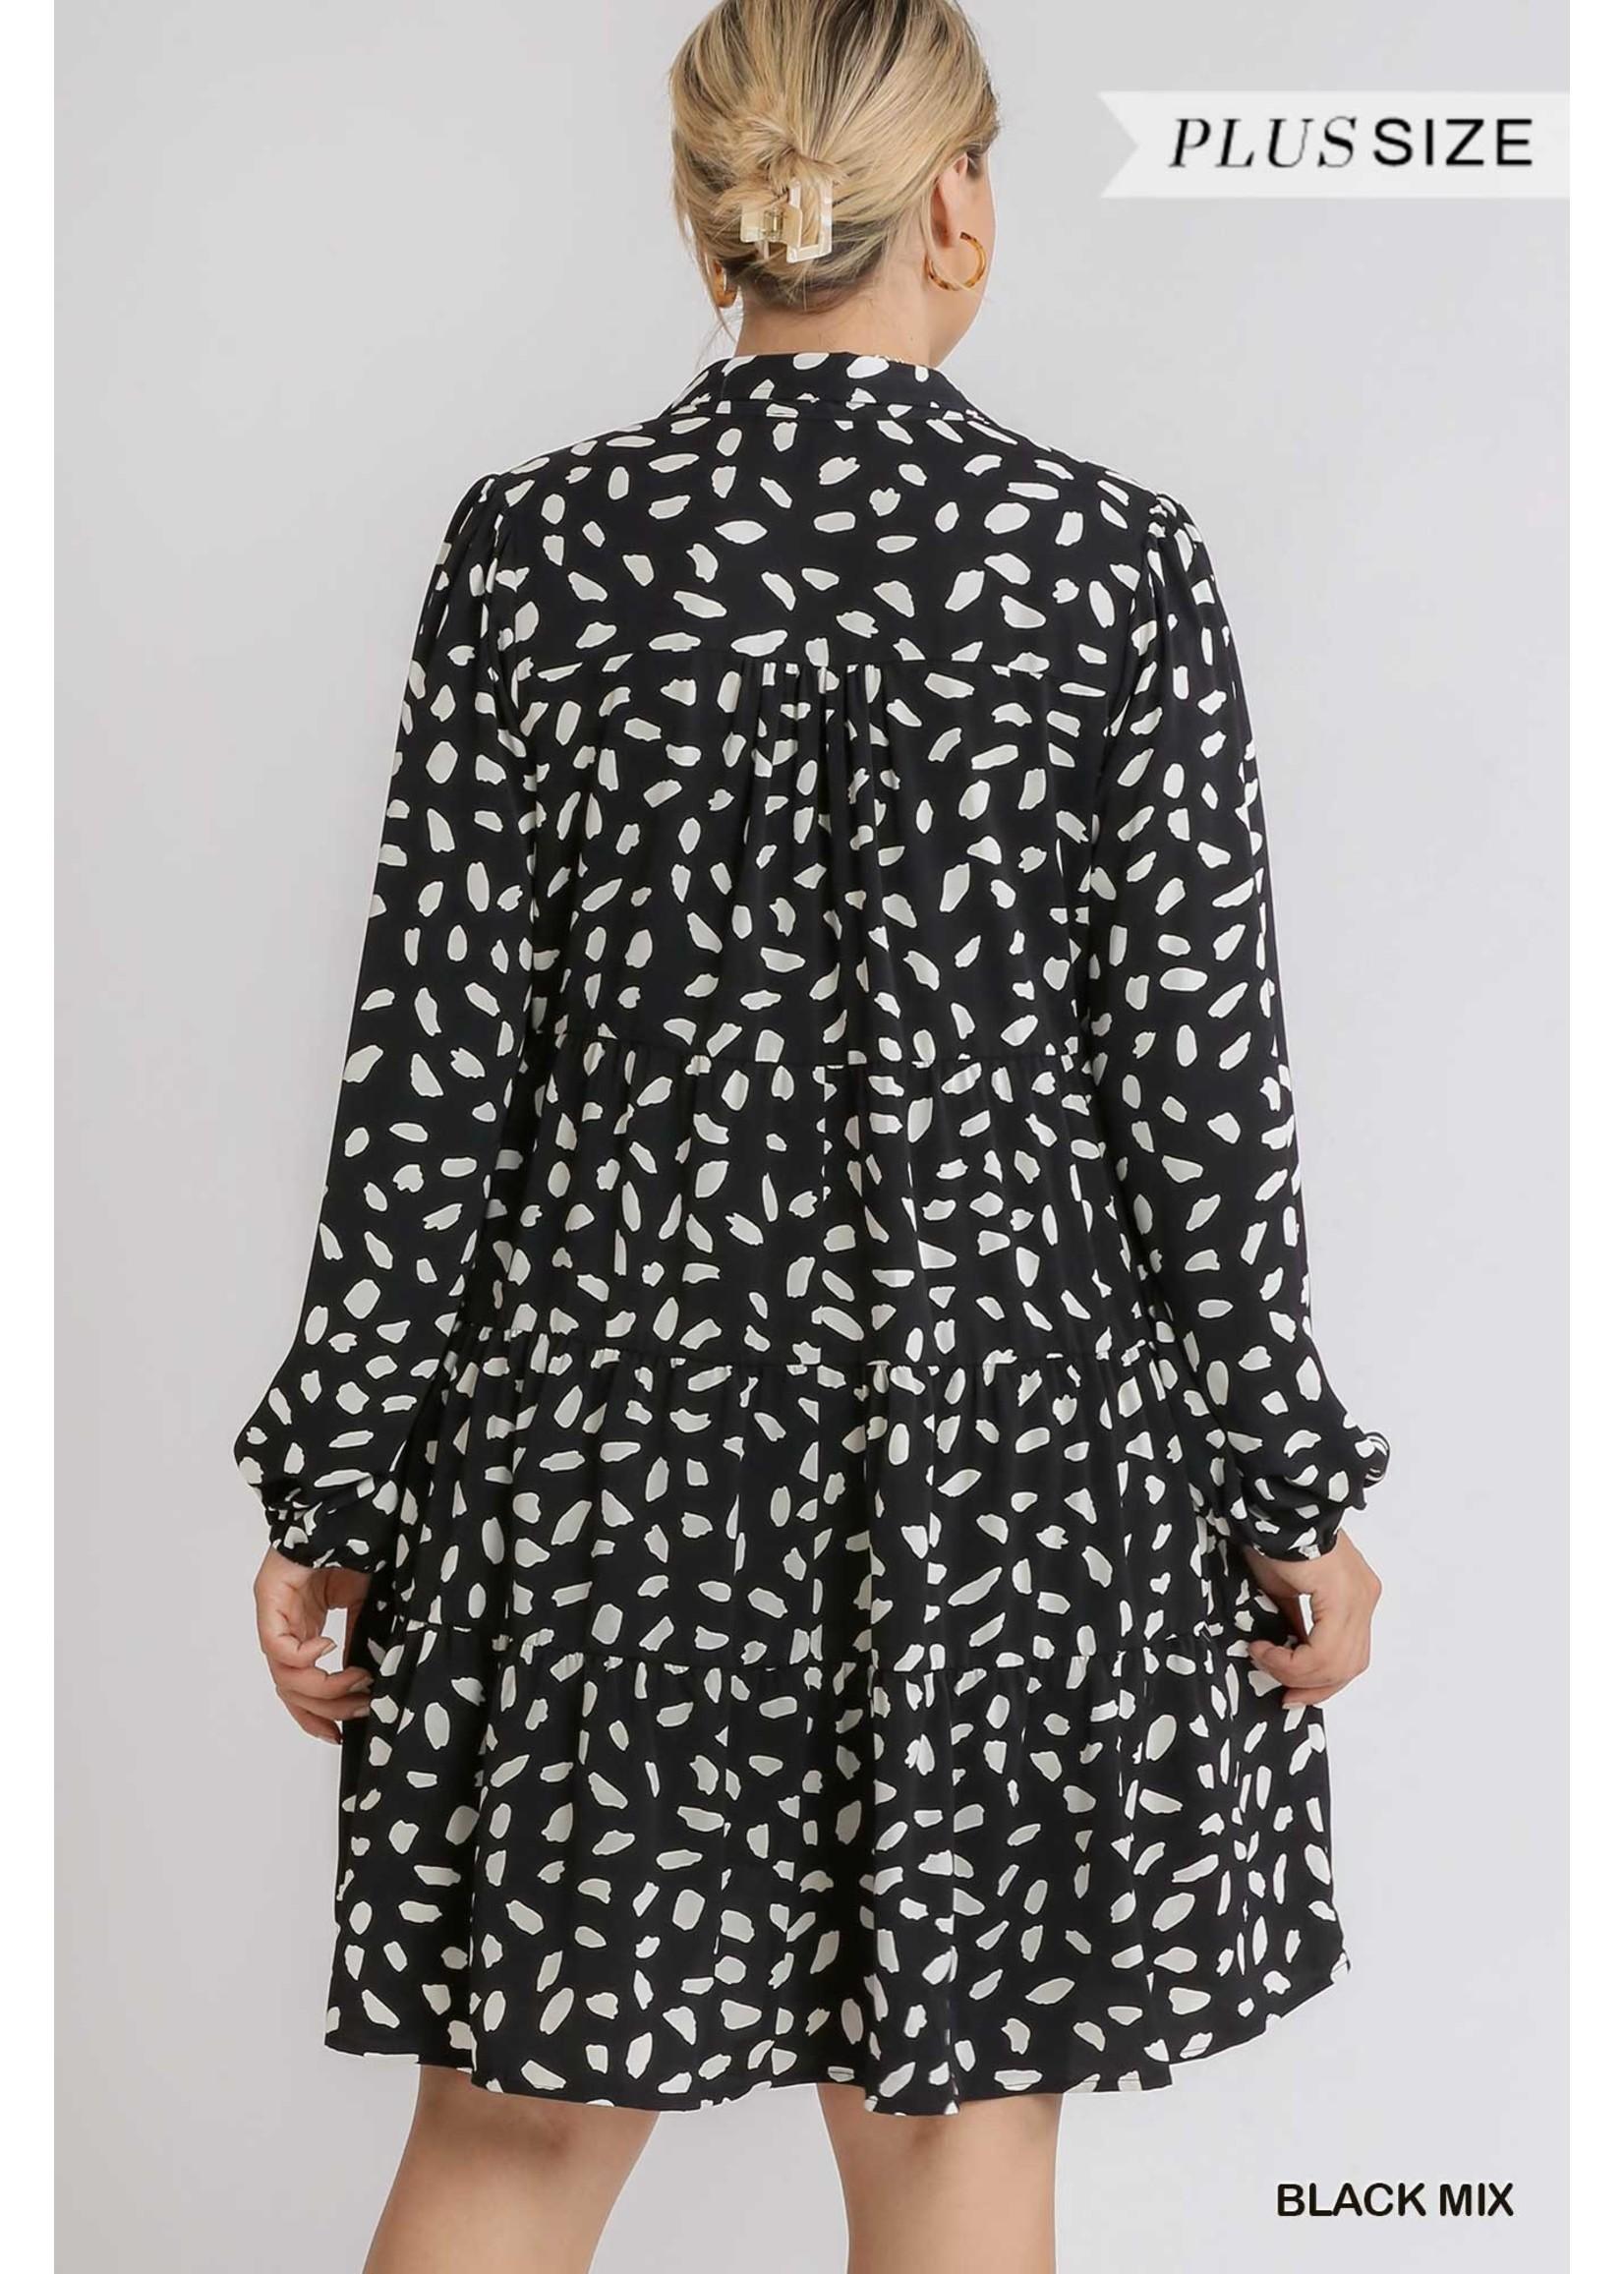 Umgee Animal Print Dress - PLUS